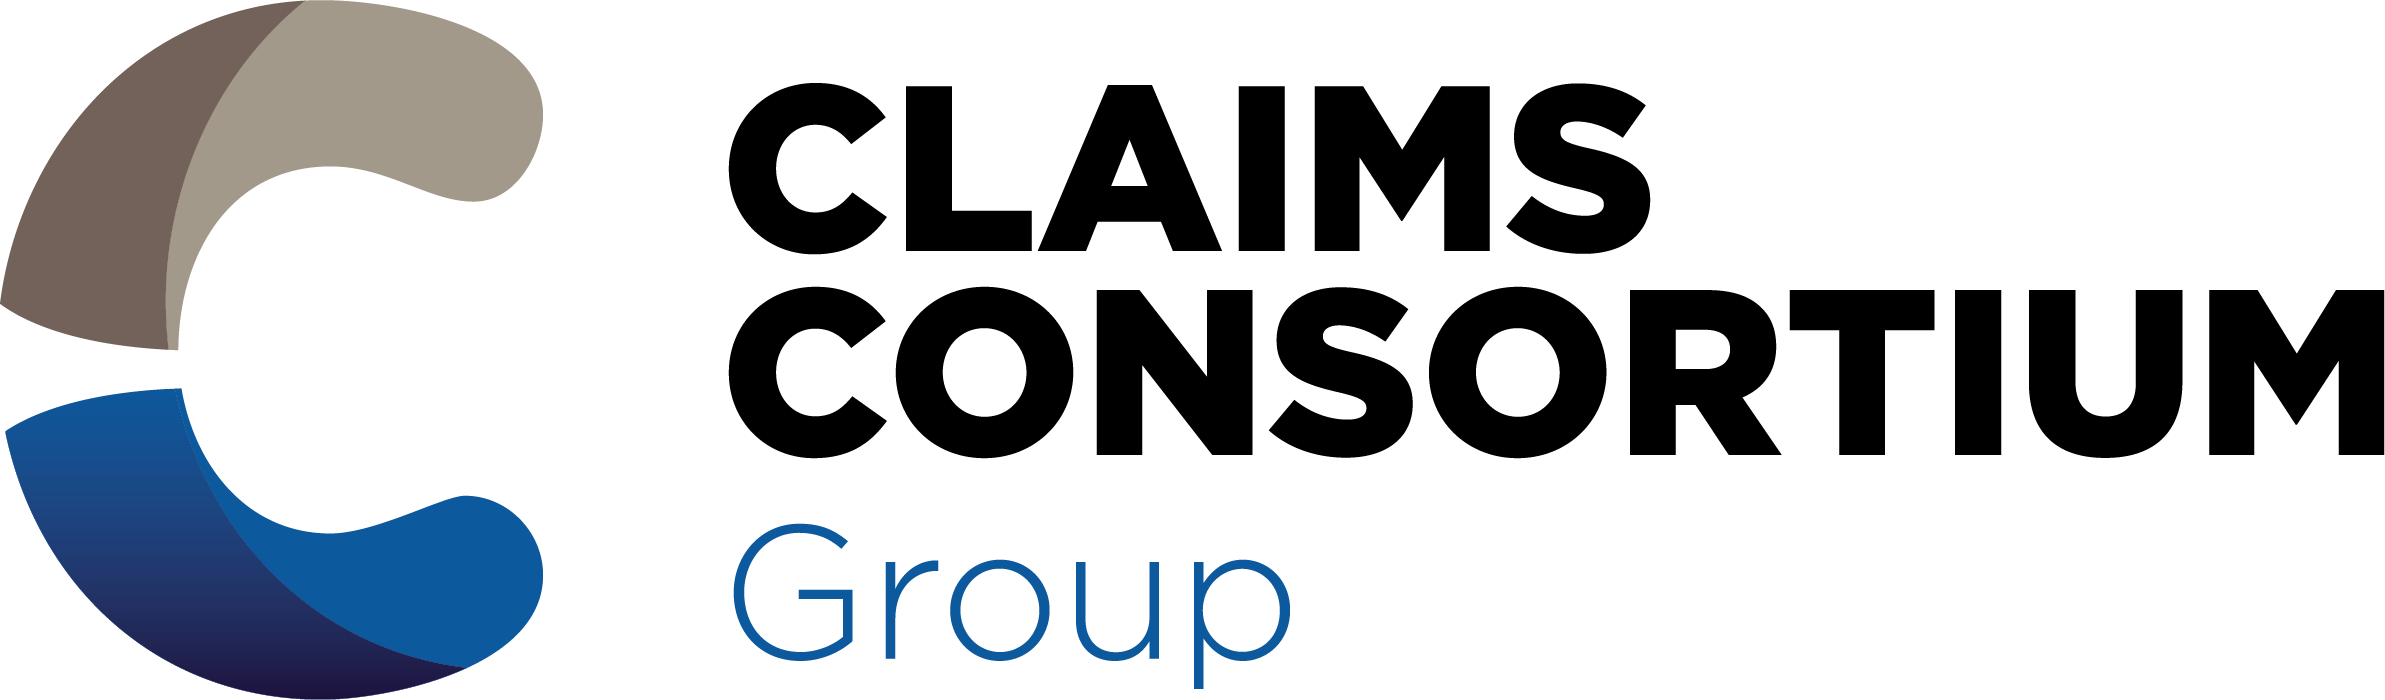 Claims Consortium Group Logo in Full Colour